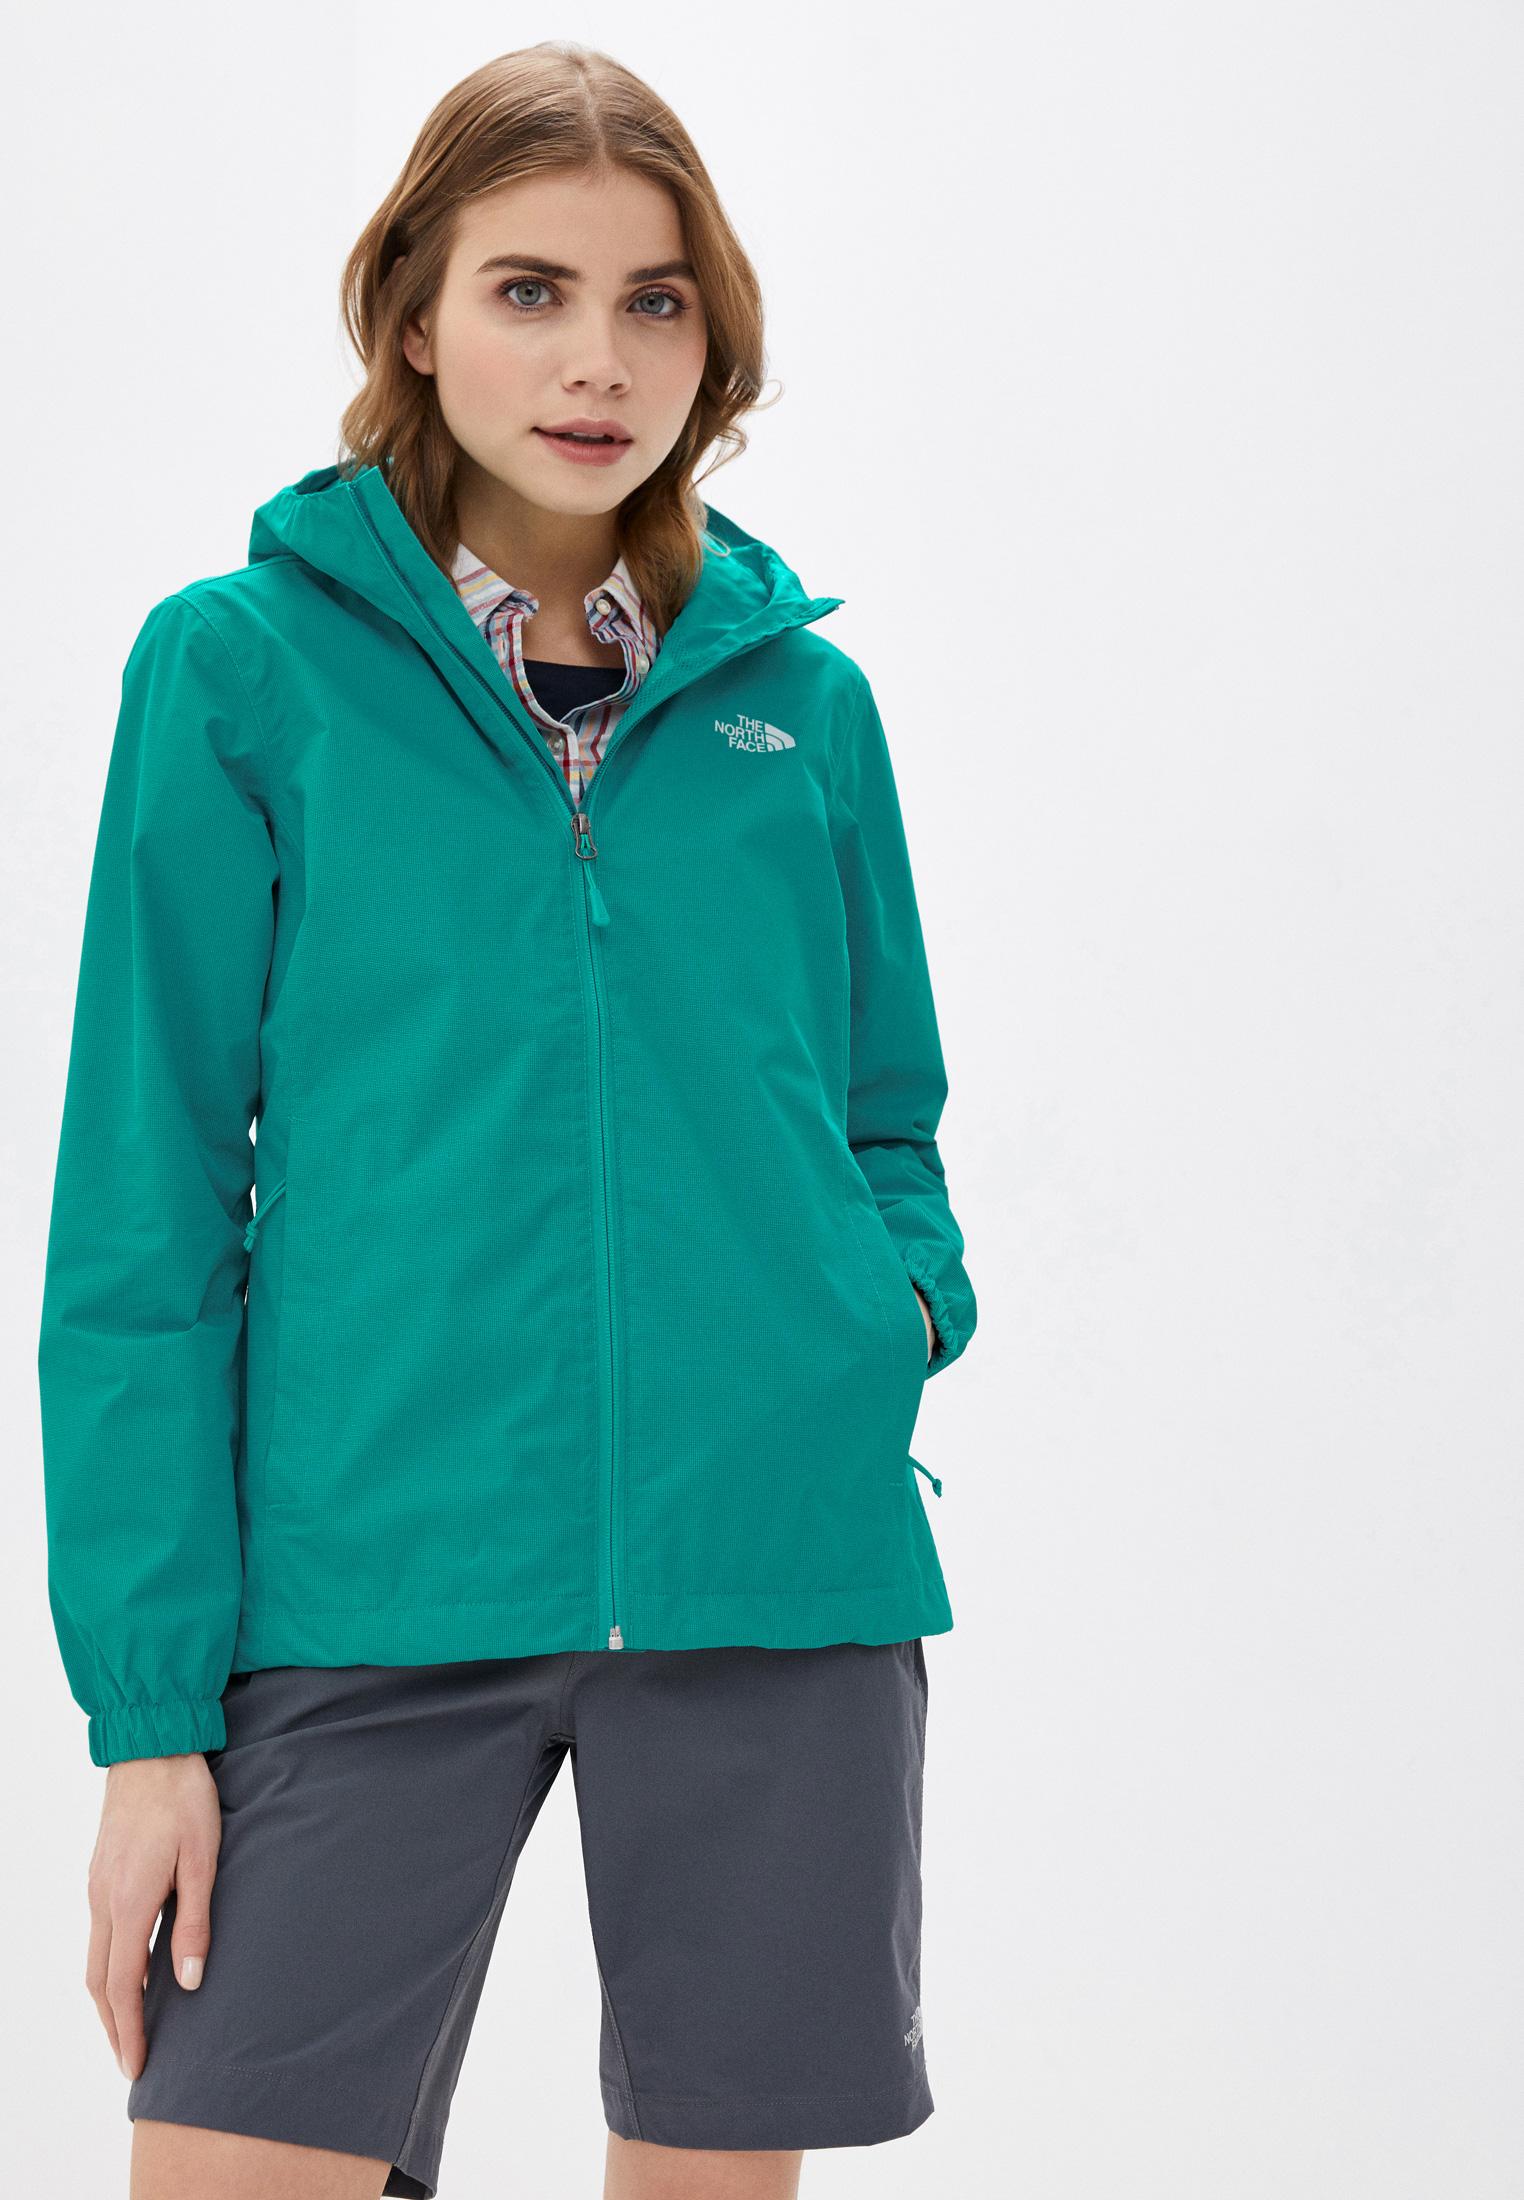 Женская верхняя одежда The North Face (Зе Норт Фейс) T0A8BAA7Z